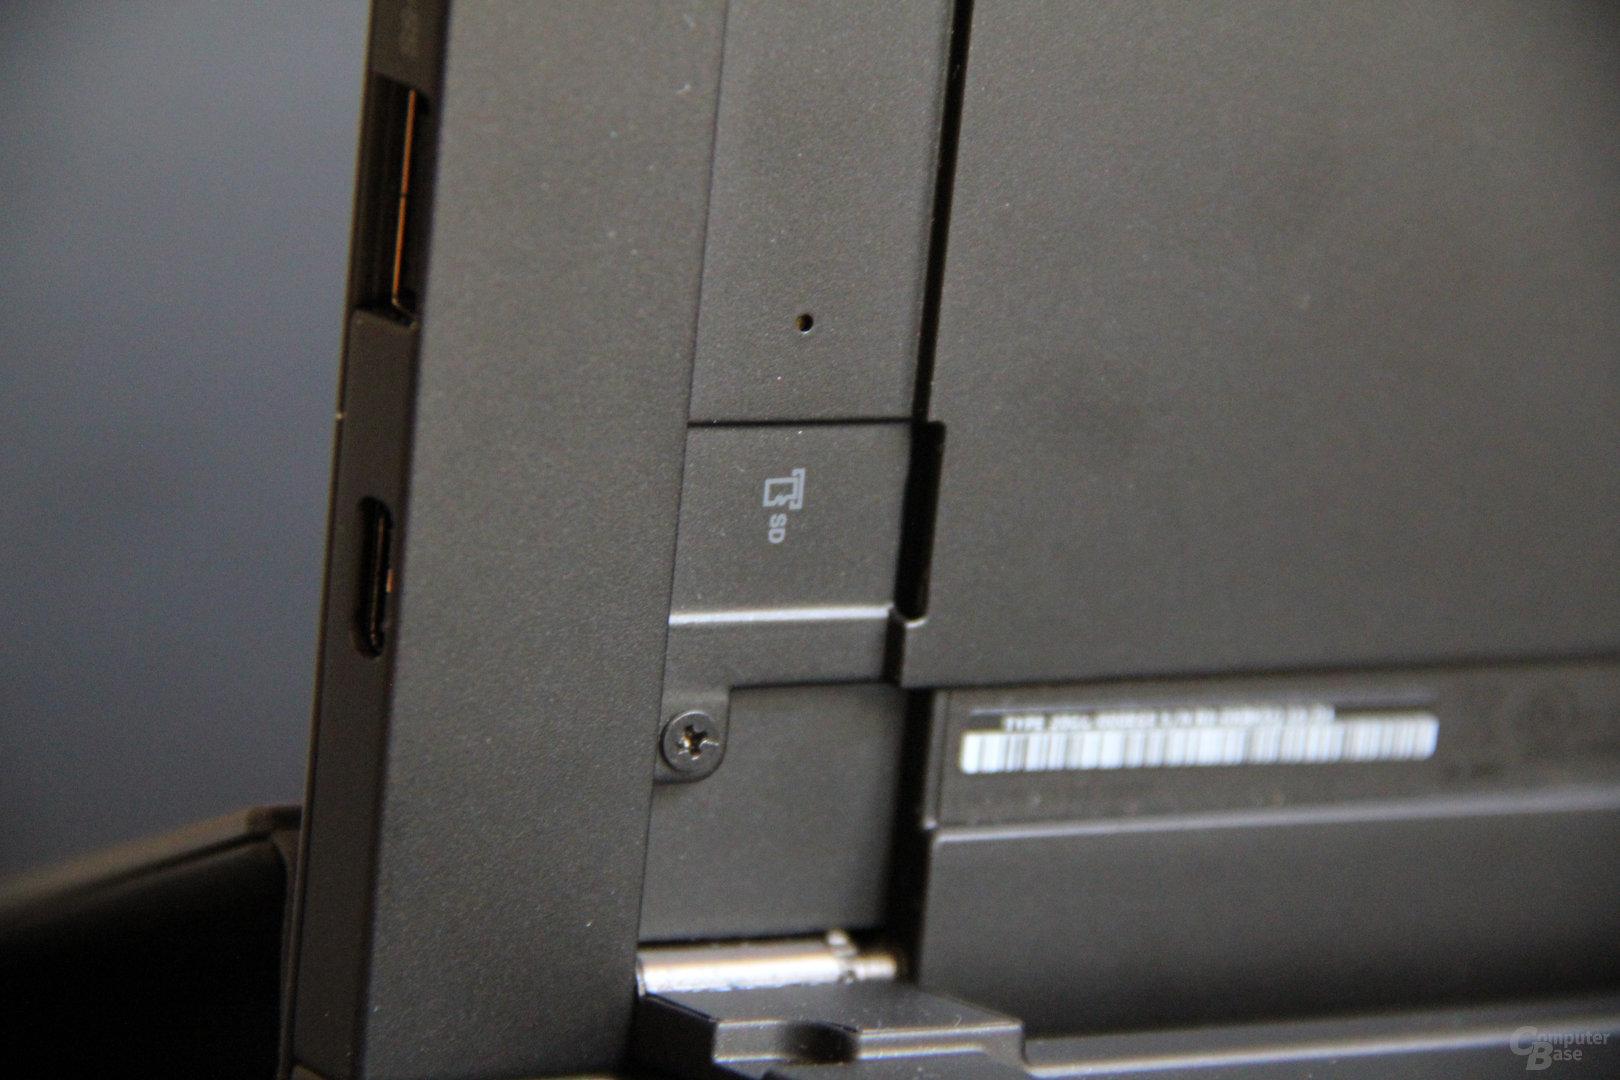 MicroSD-Einschub hinter dem Standfuß